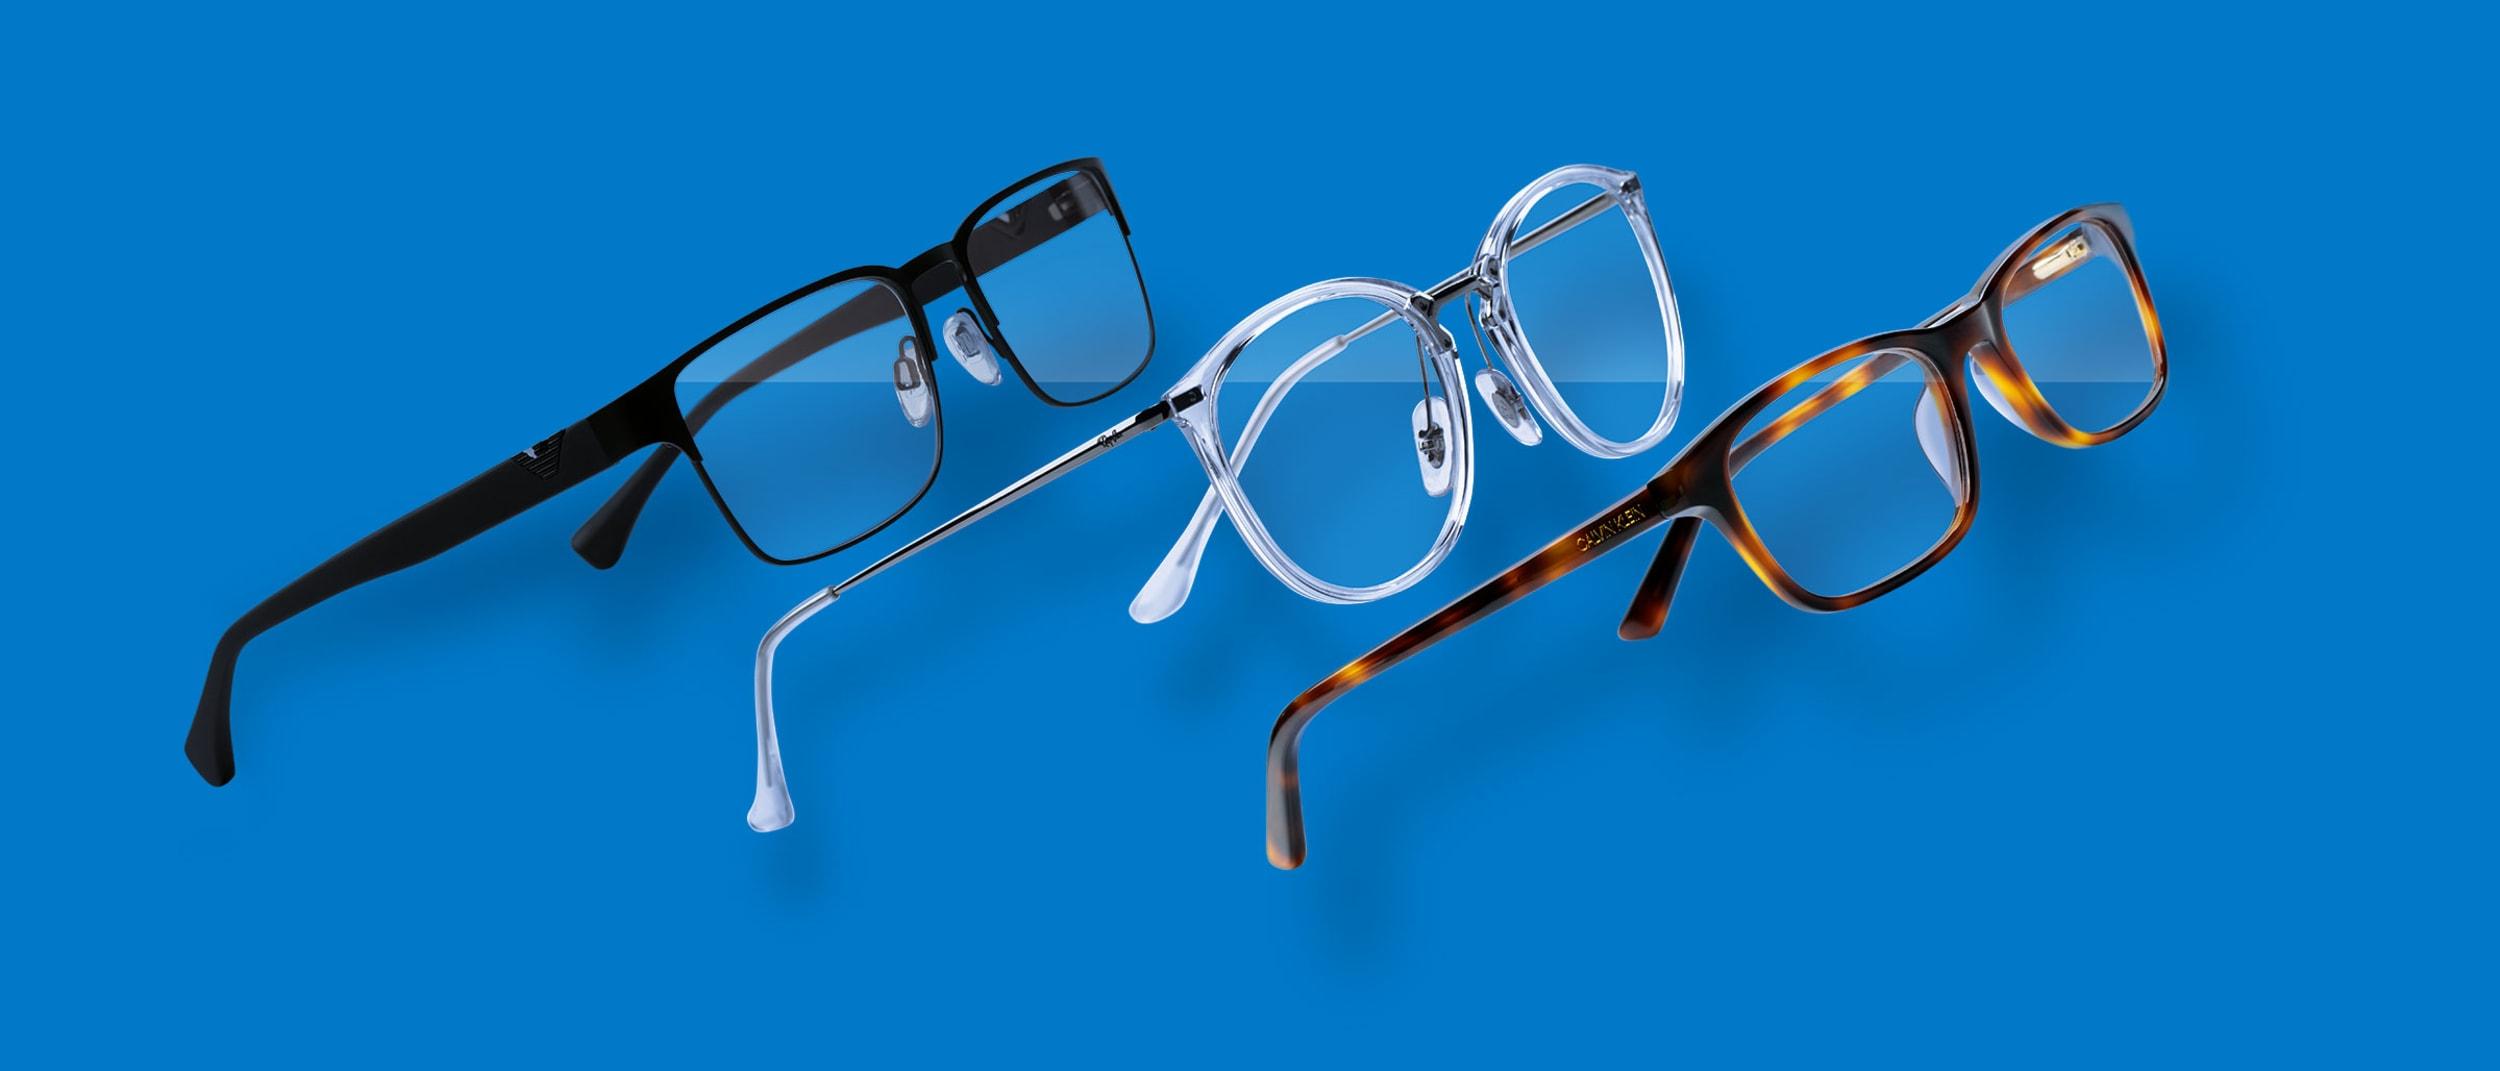 Bupa Optical: No or Low Gap